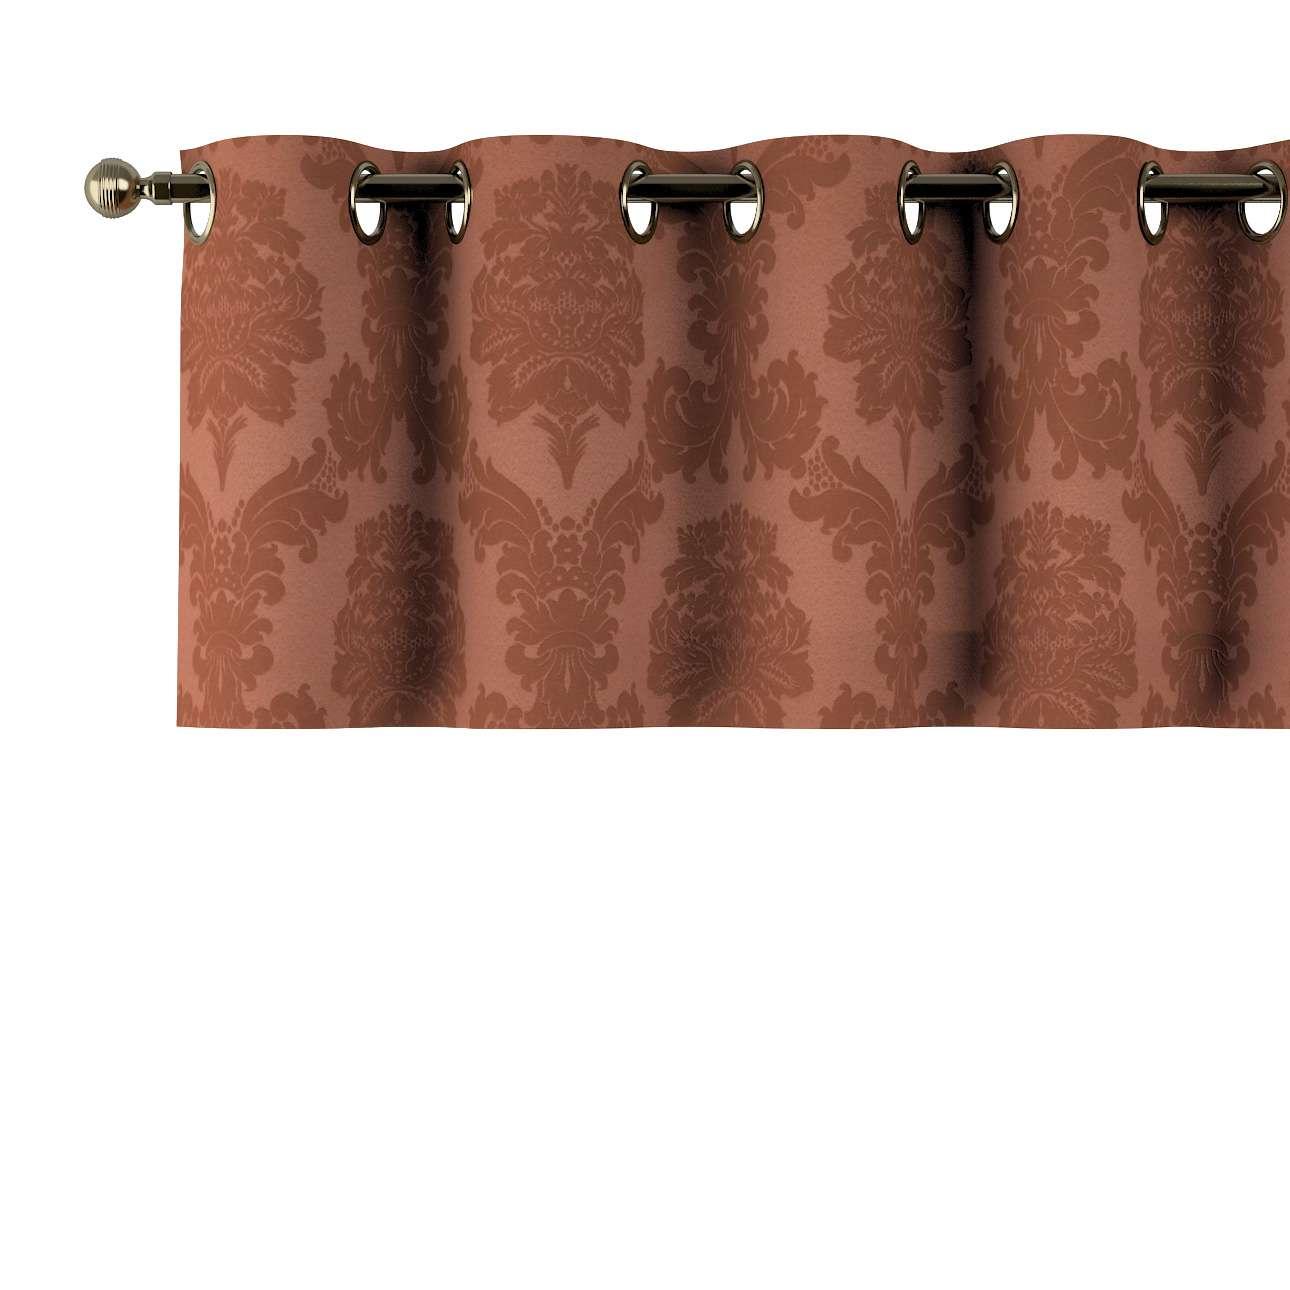 Lambrekin na kółkach 130x40cm w kolekcji Damasco, tkanina: 613-88